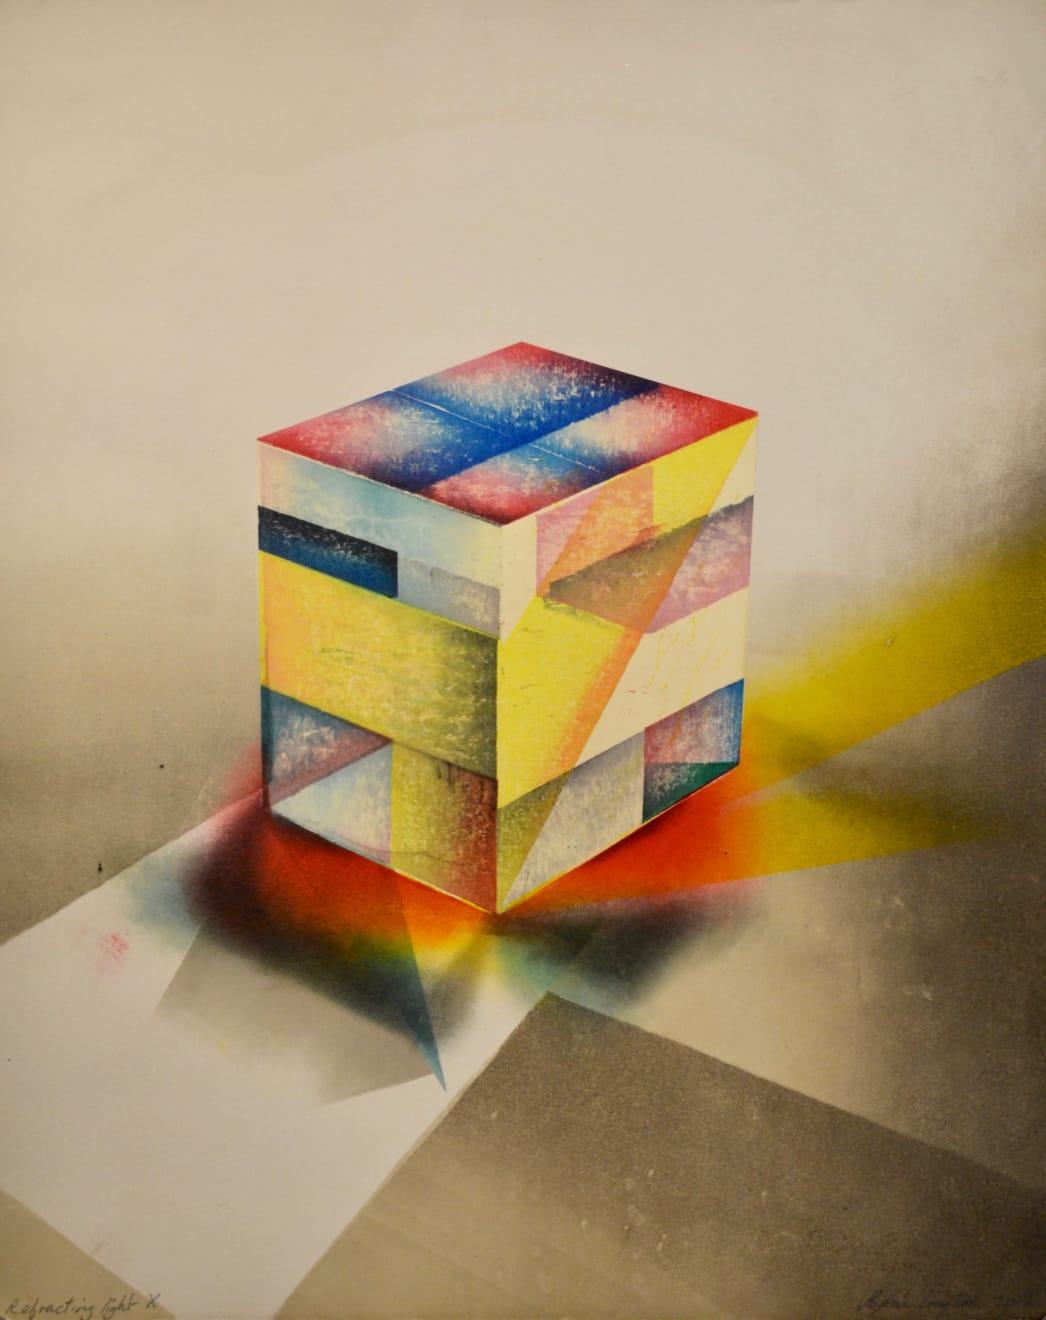 Sophie Layton, Refracting Light X, 2018